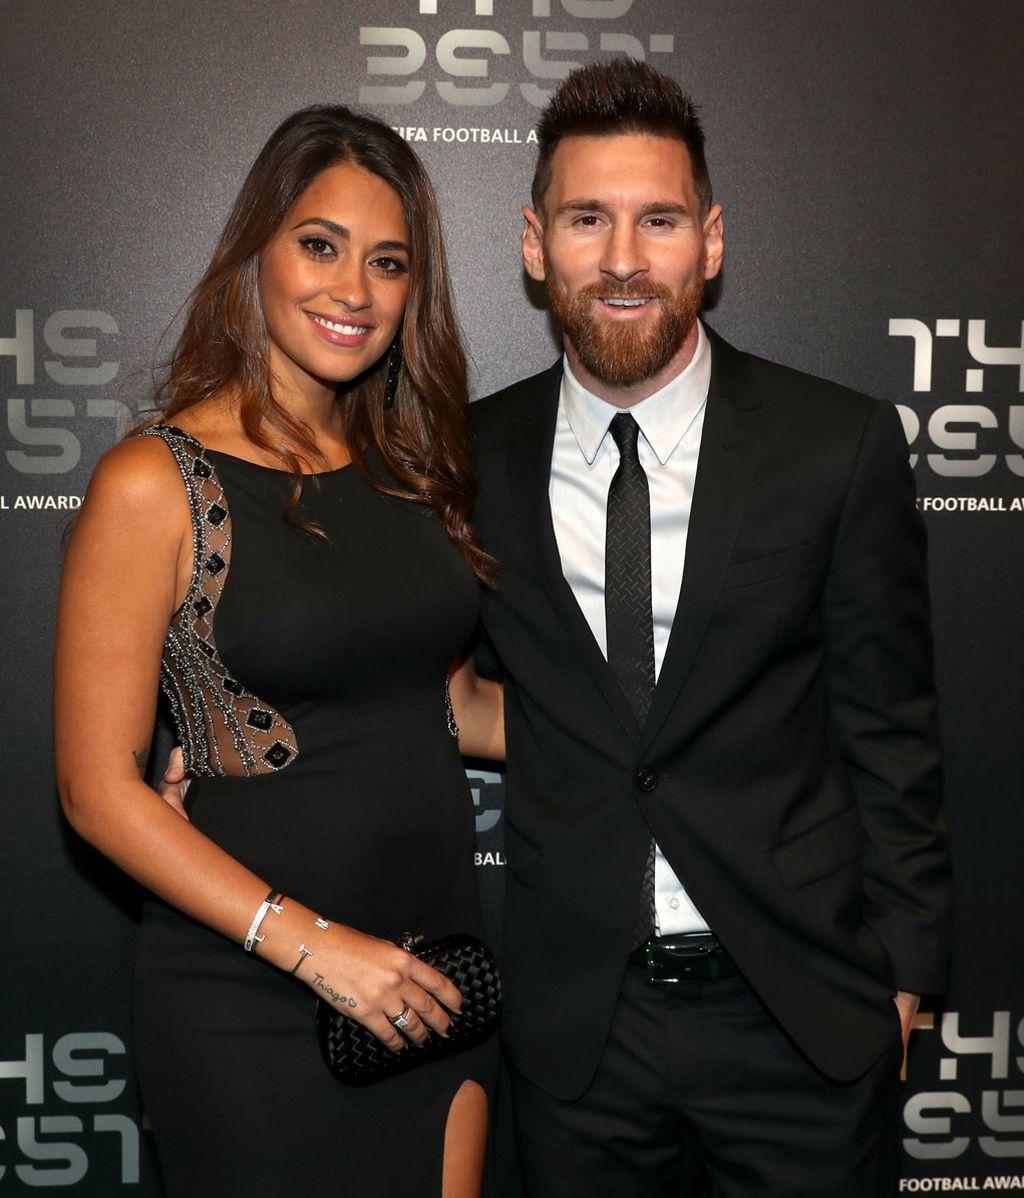 Antonella-Leo-Messi-embarazo-premios-the-best